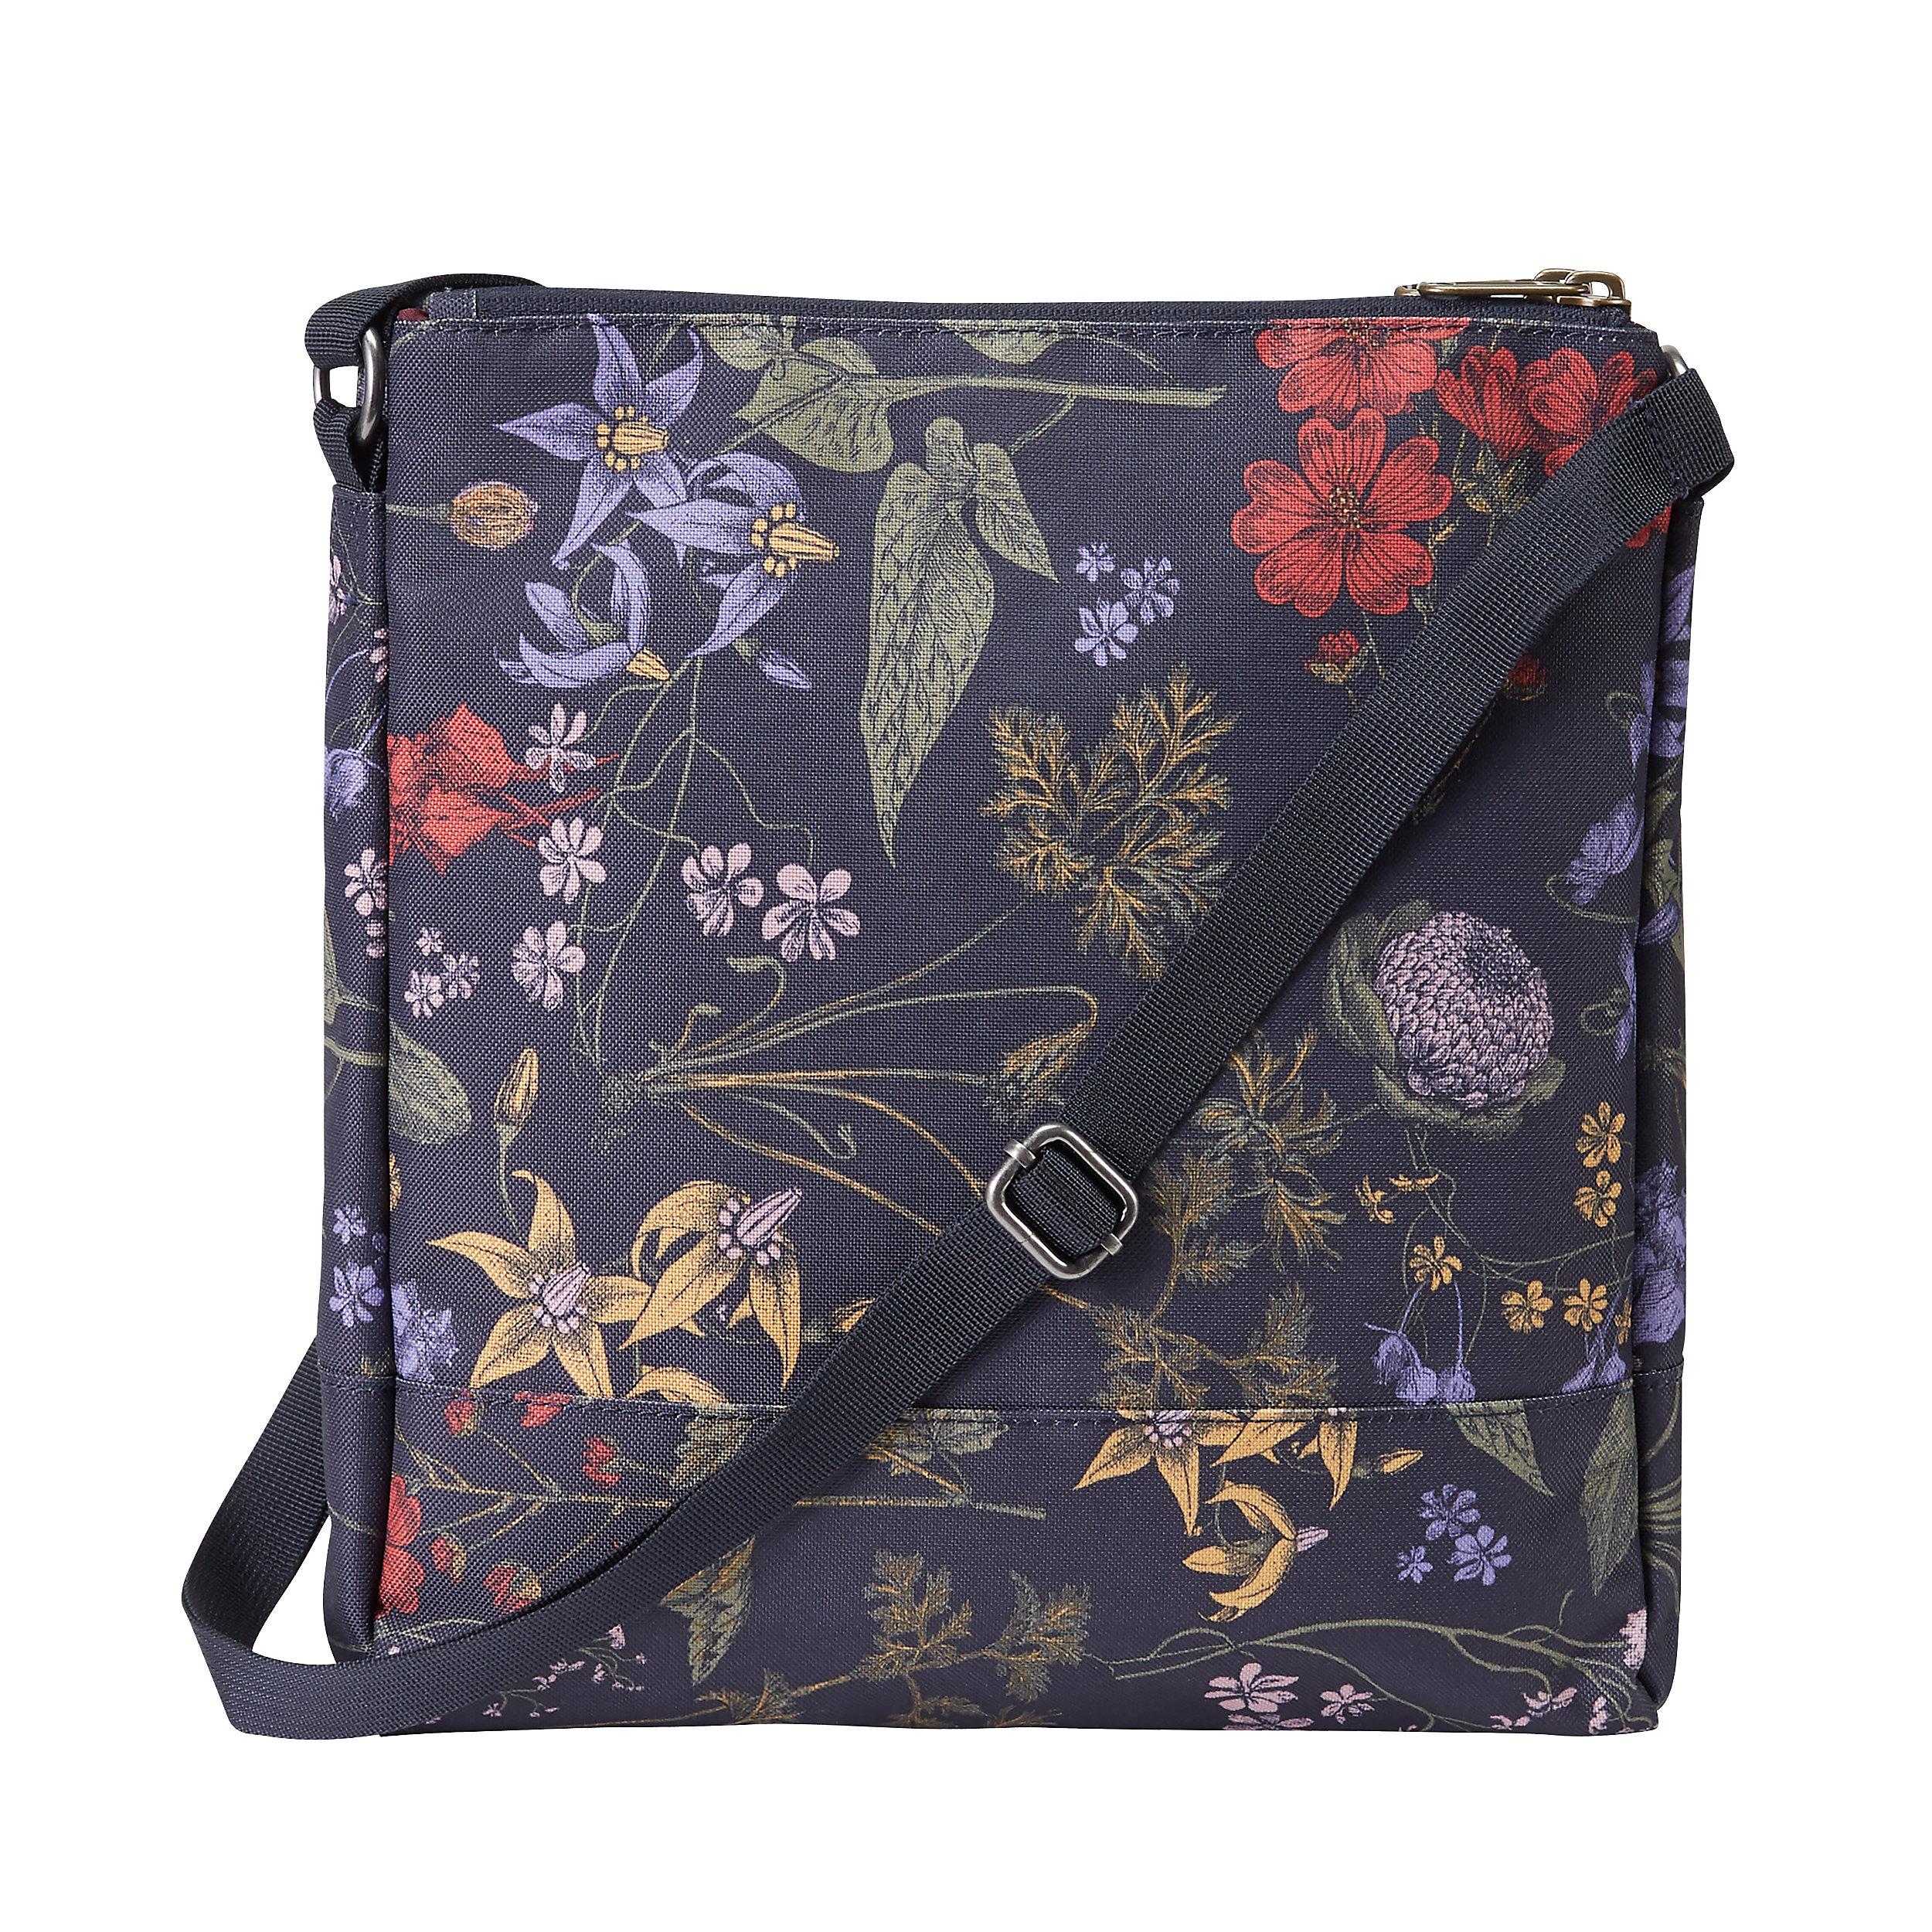 Crossbody Bag Jordy Crossbody Packs